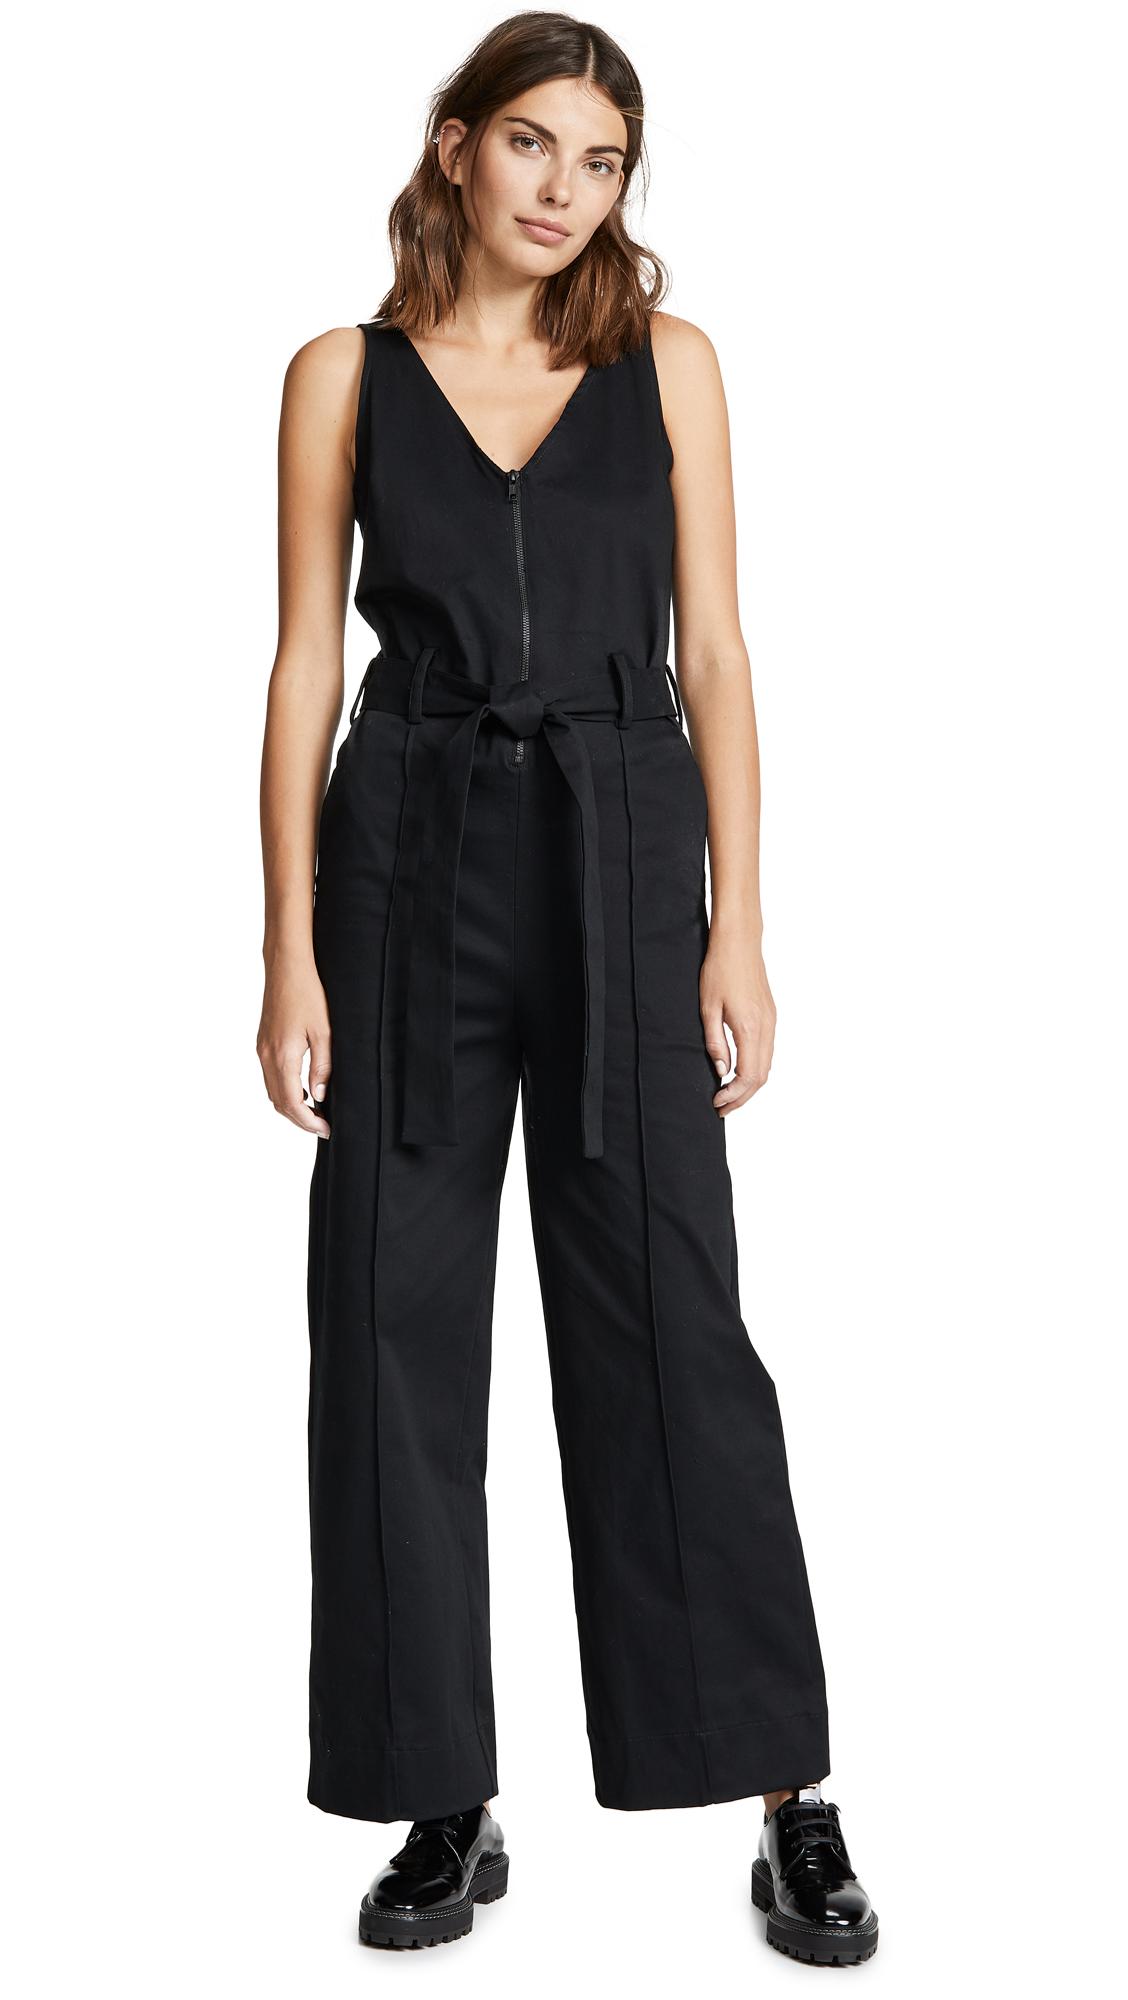 THE RANGE Belted Jumpsuit in Black